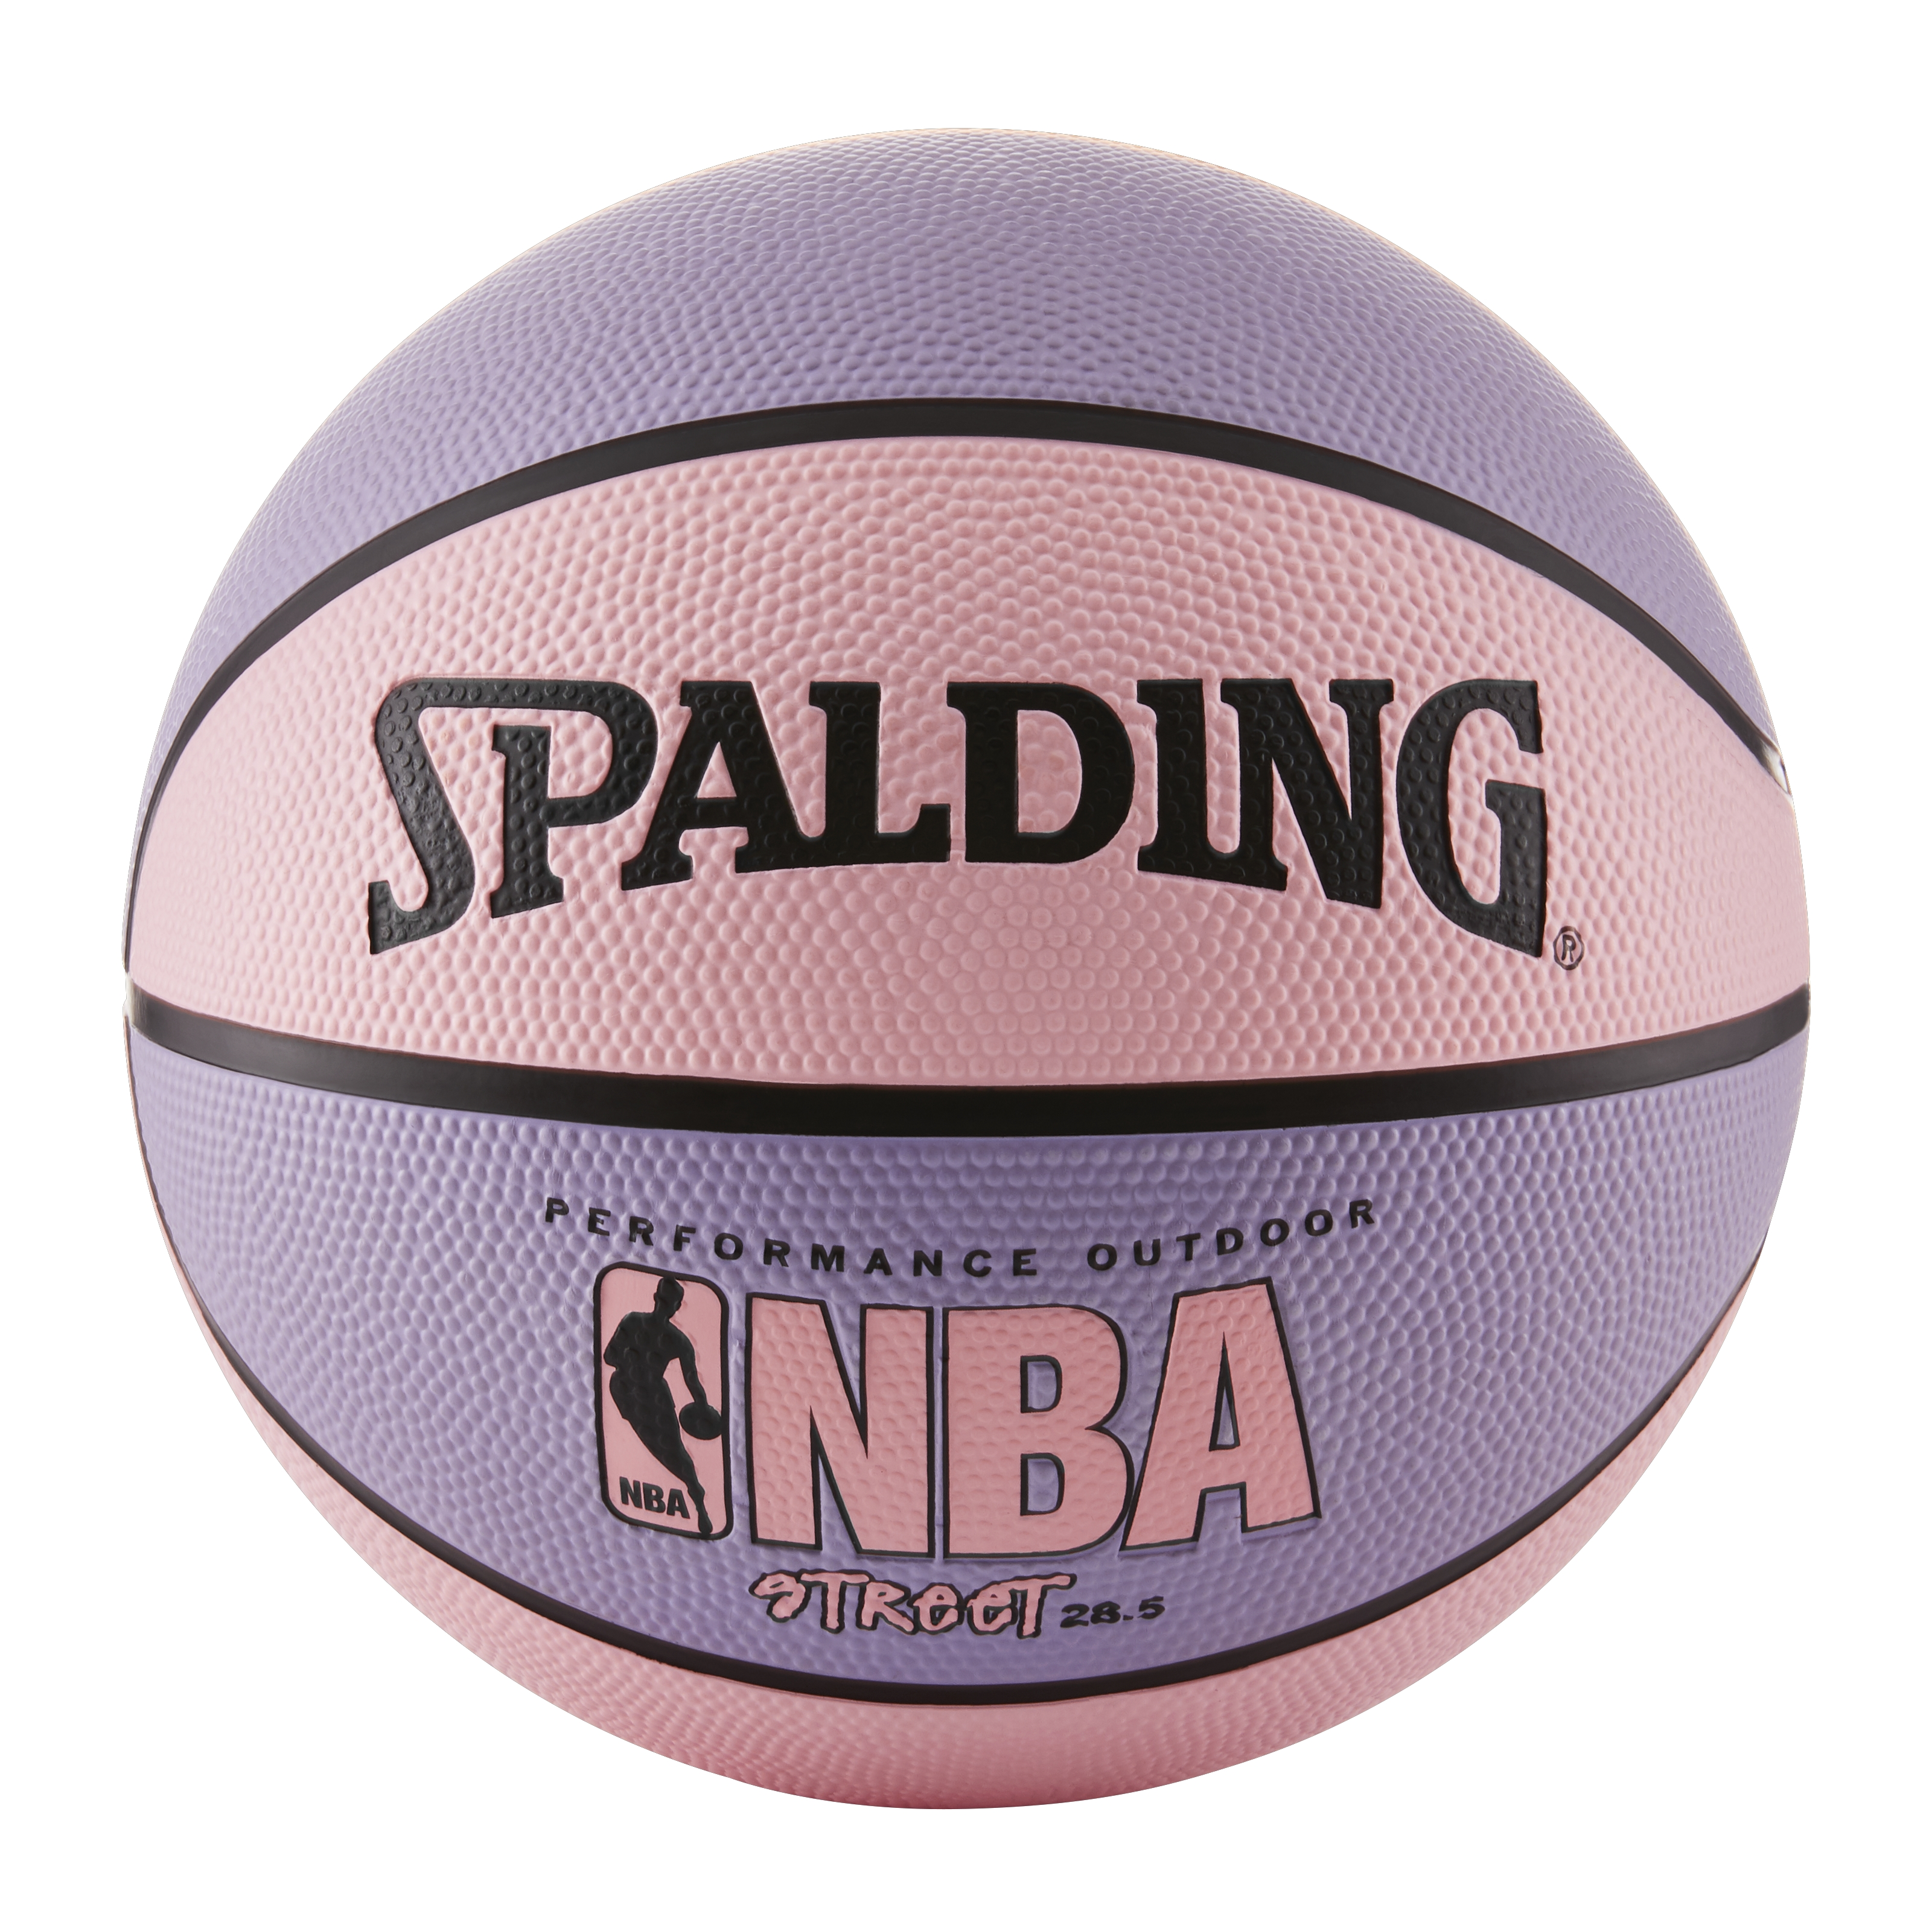 "Spalding NBA Street 28.5"" Basketball - Pink/Purple"